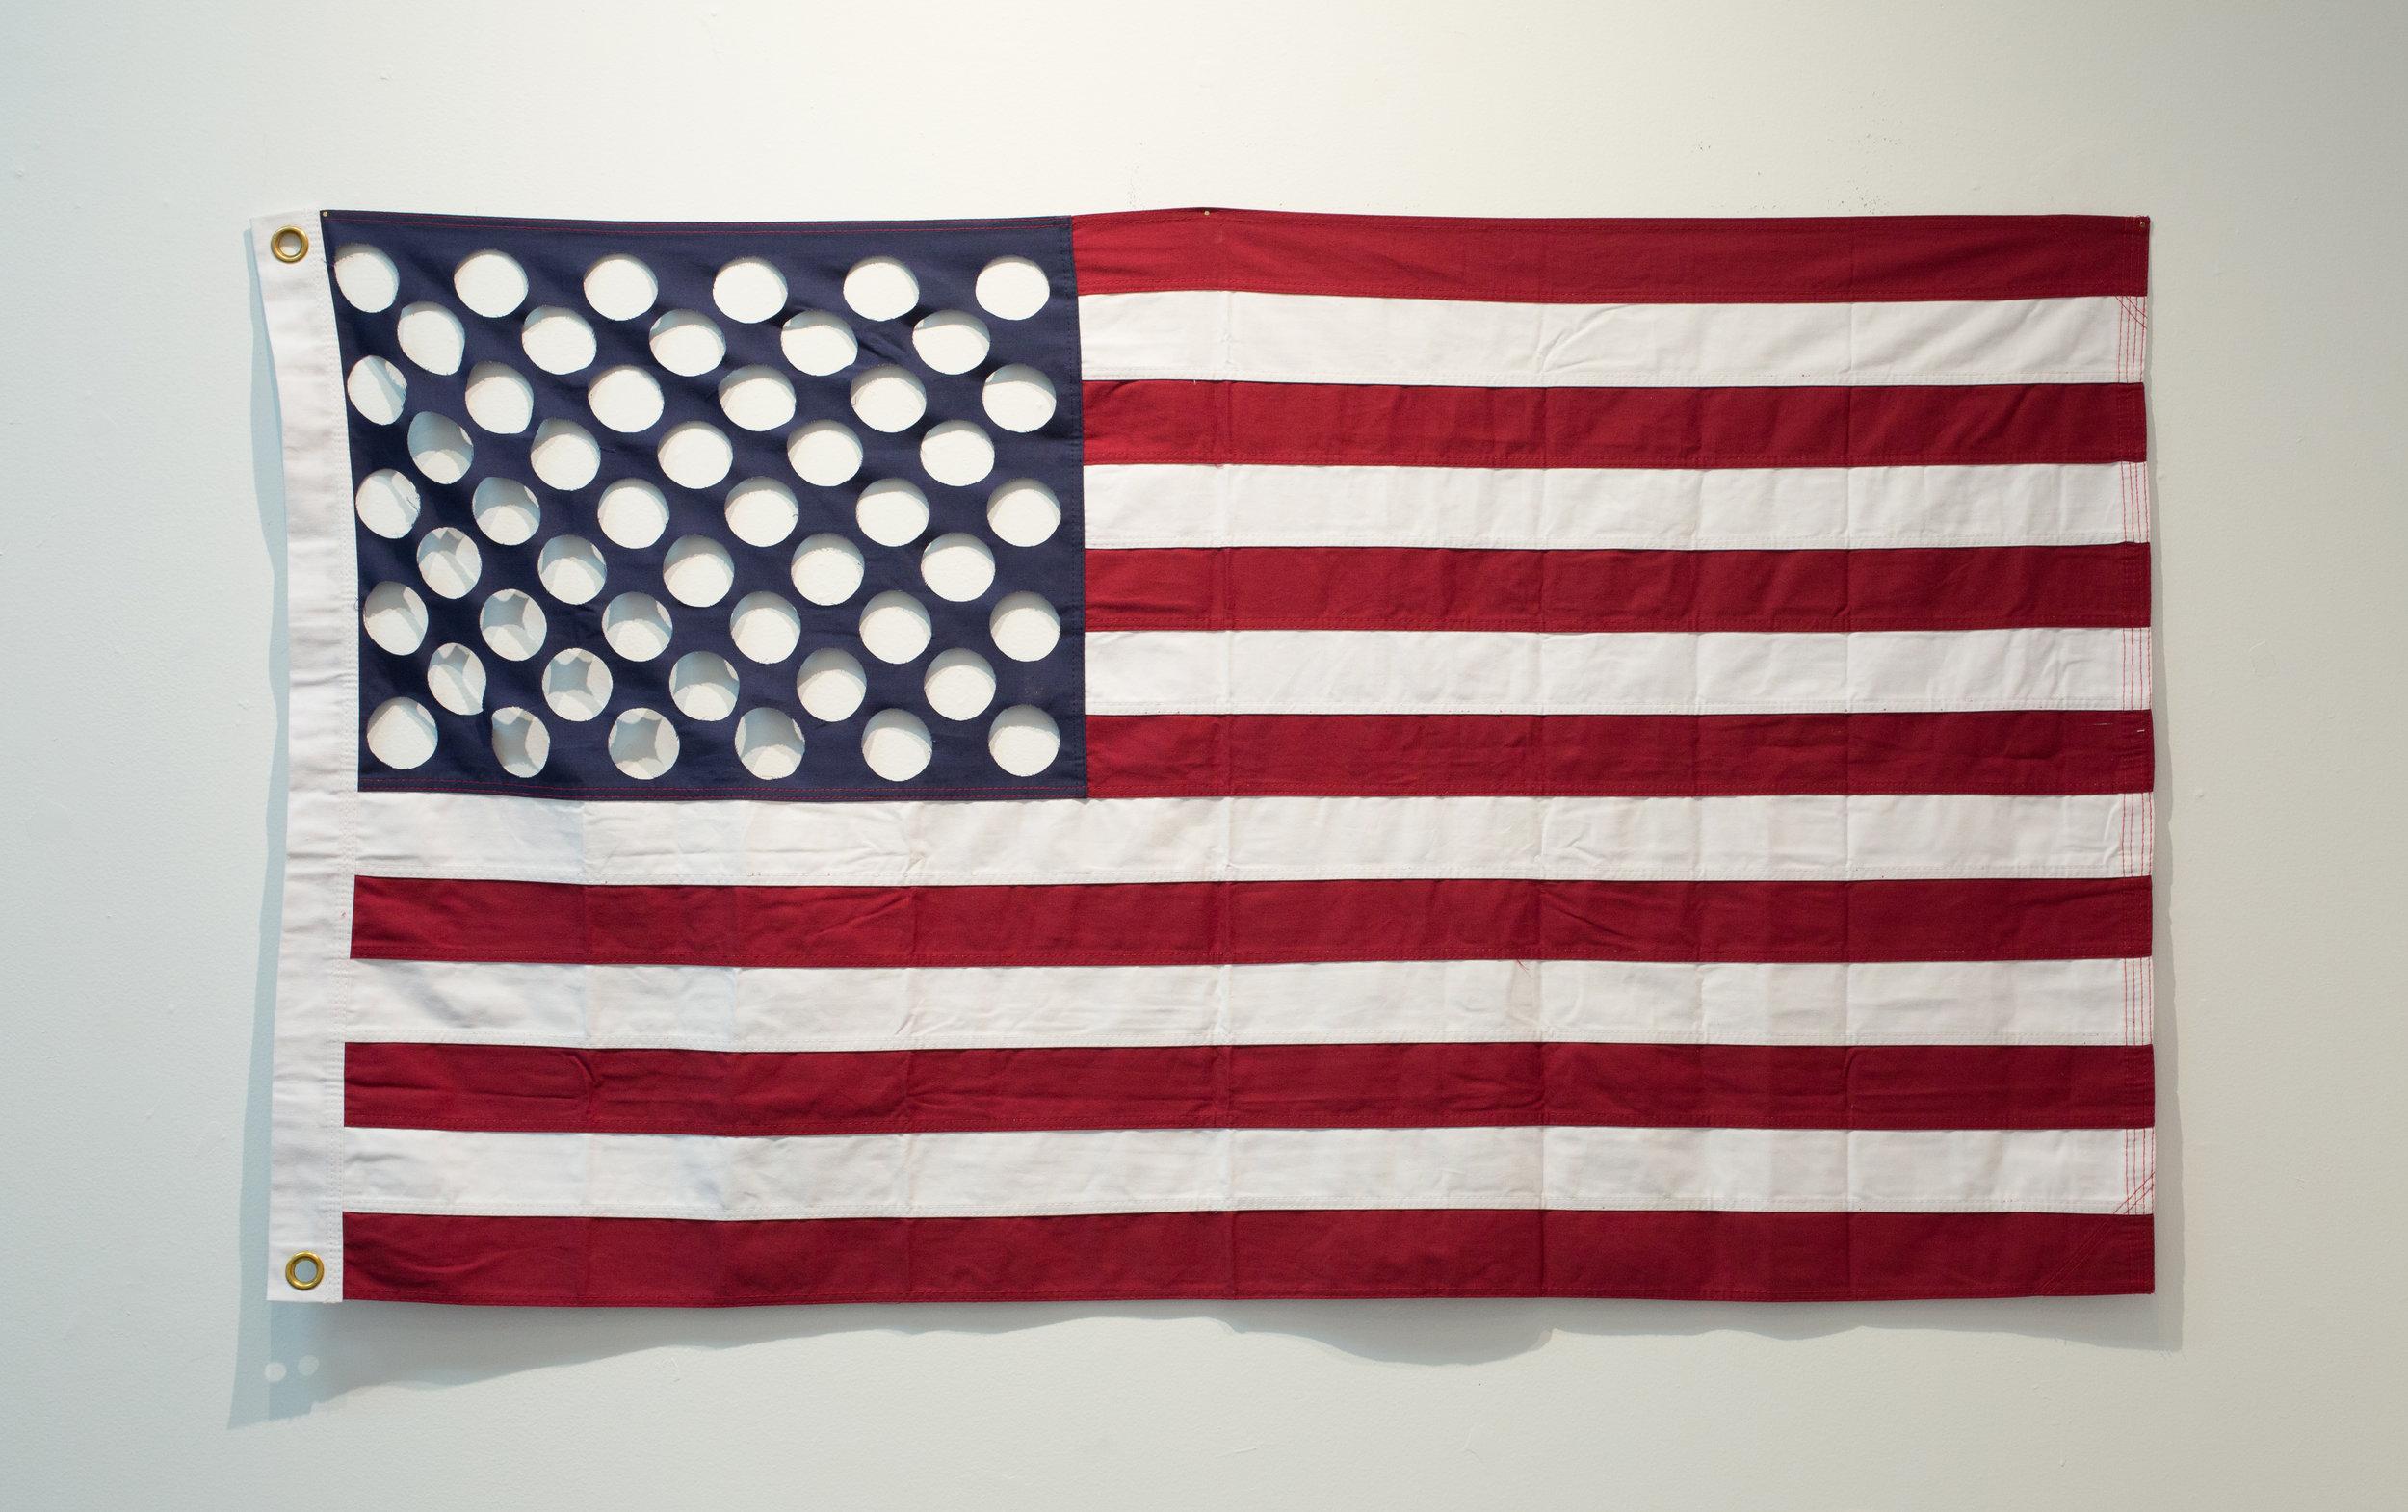 "#22 (One Nation, Indivisible)  United States Flag 36""x60"" 2018  Photo Courtesy: Anna C. Robertson"